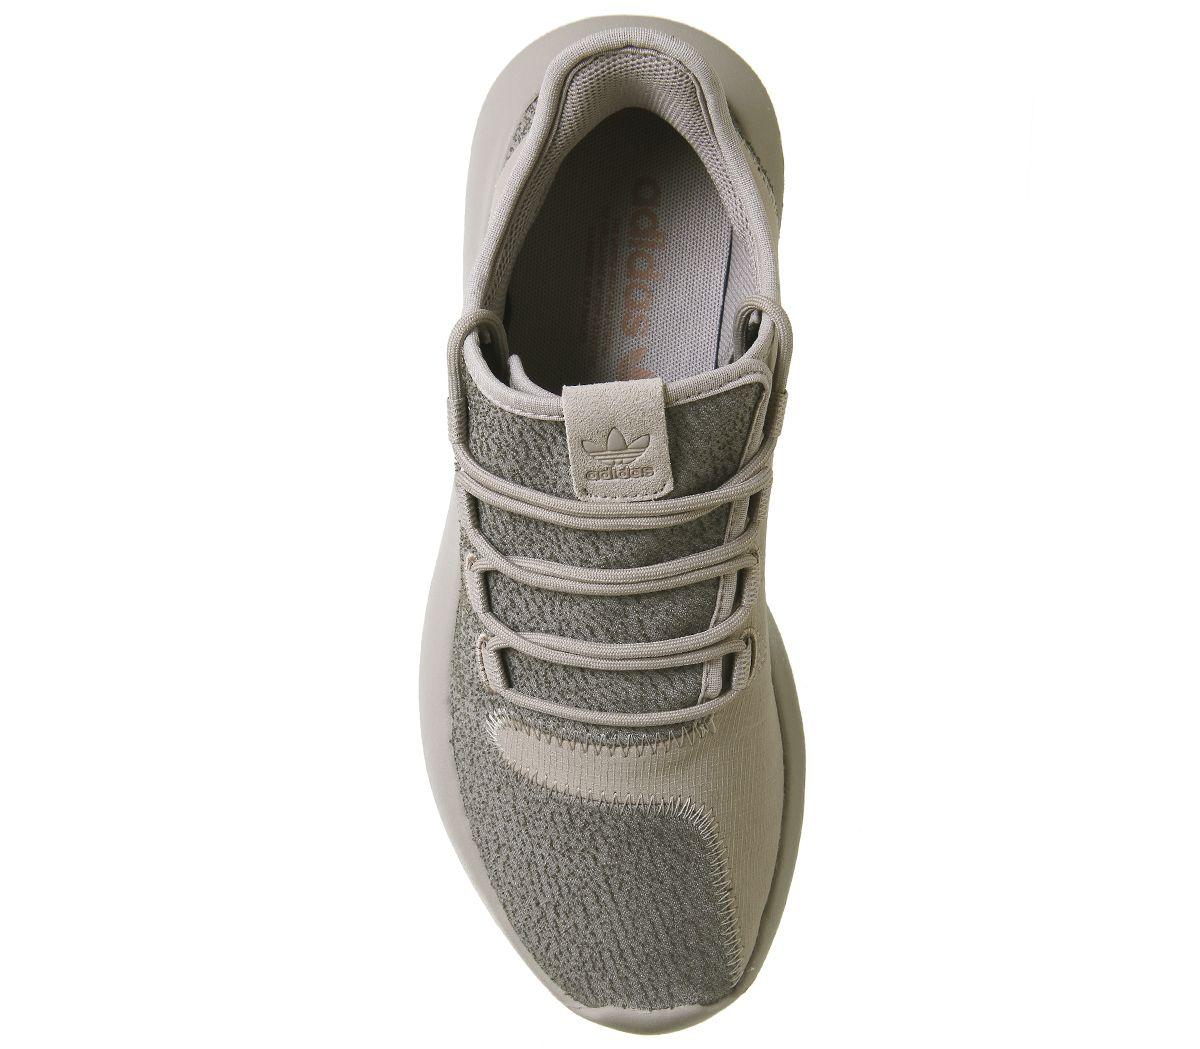 Top Hardware Adidas Original Schlauch Schatten Damen Schuhe